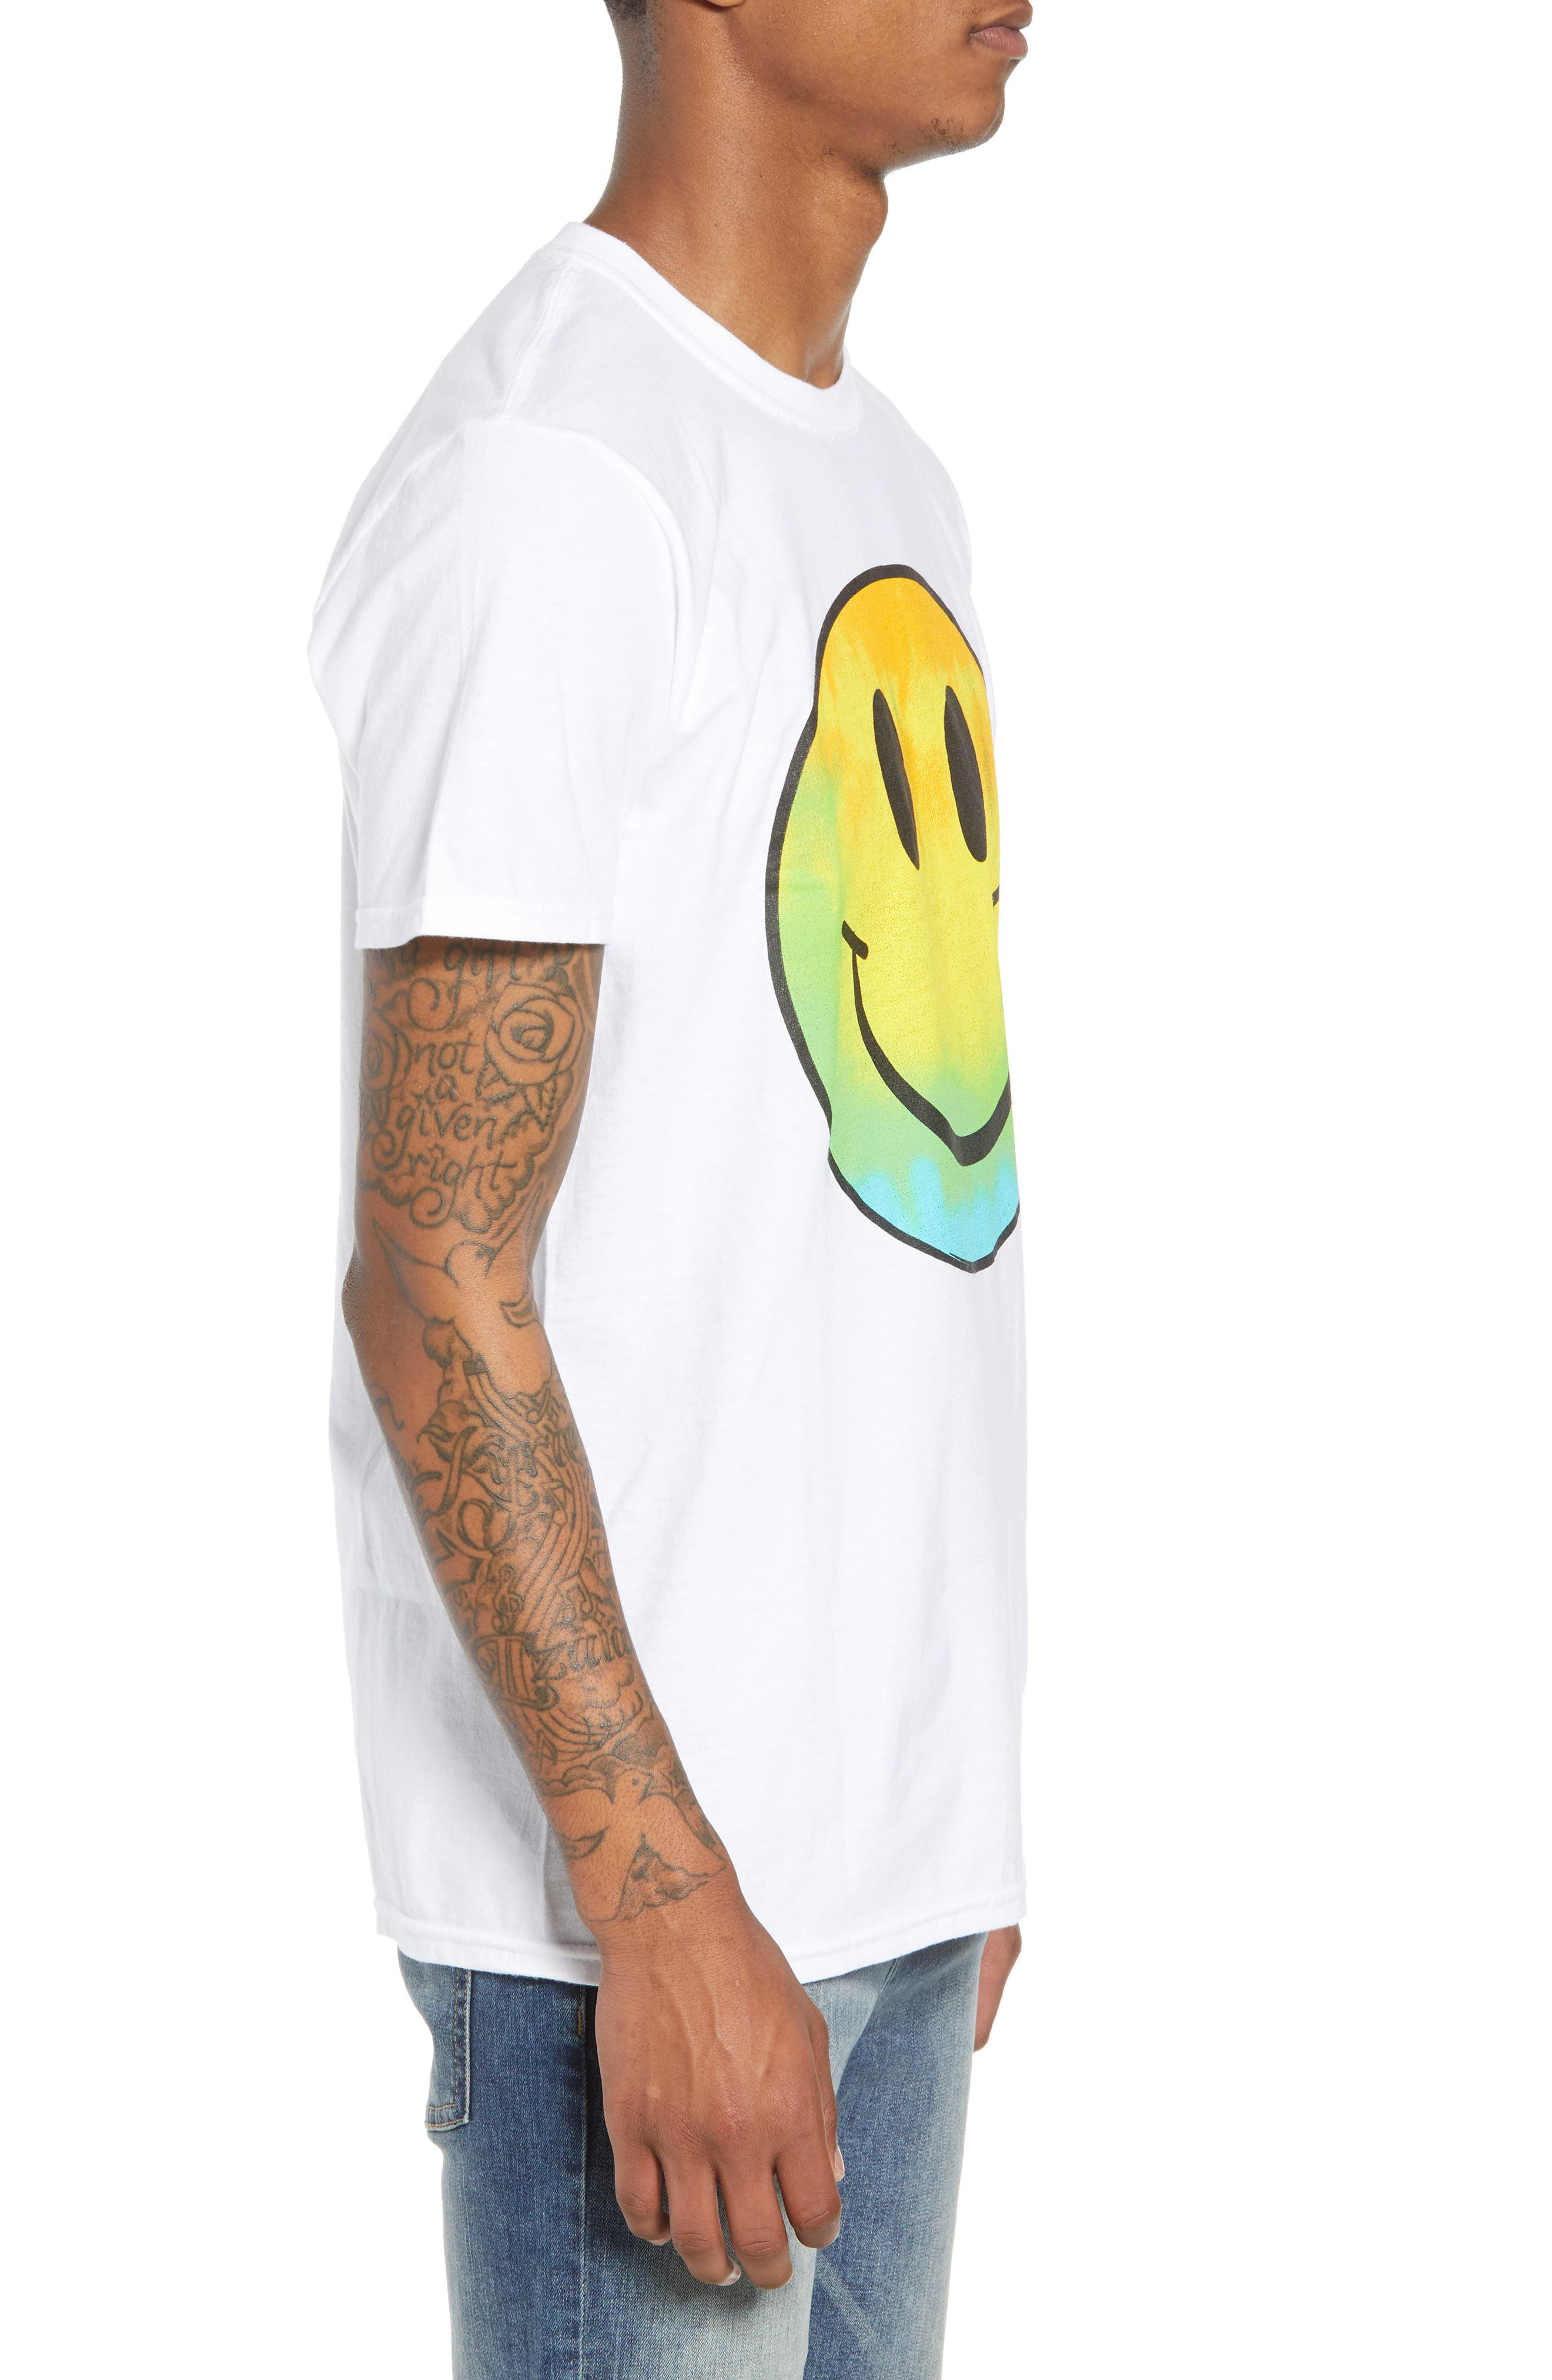 Tie Dye Smiley Face T-Shirt,                             Alternate thumbnail 3, color,                             White Tie Dye Smiley Face